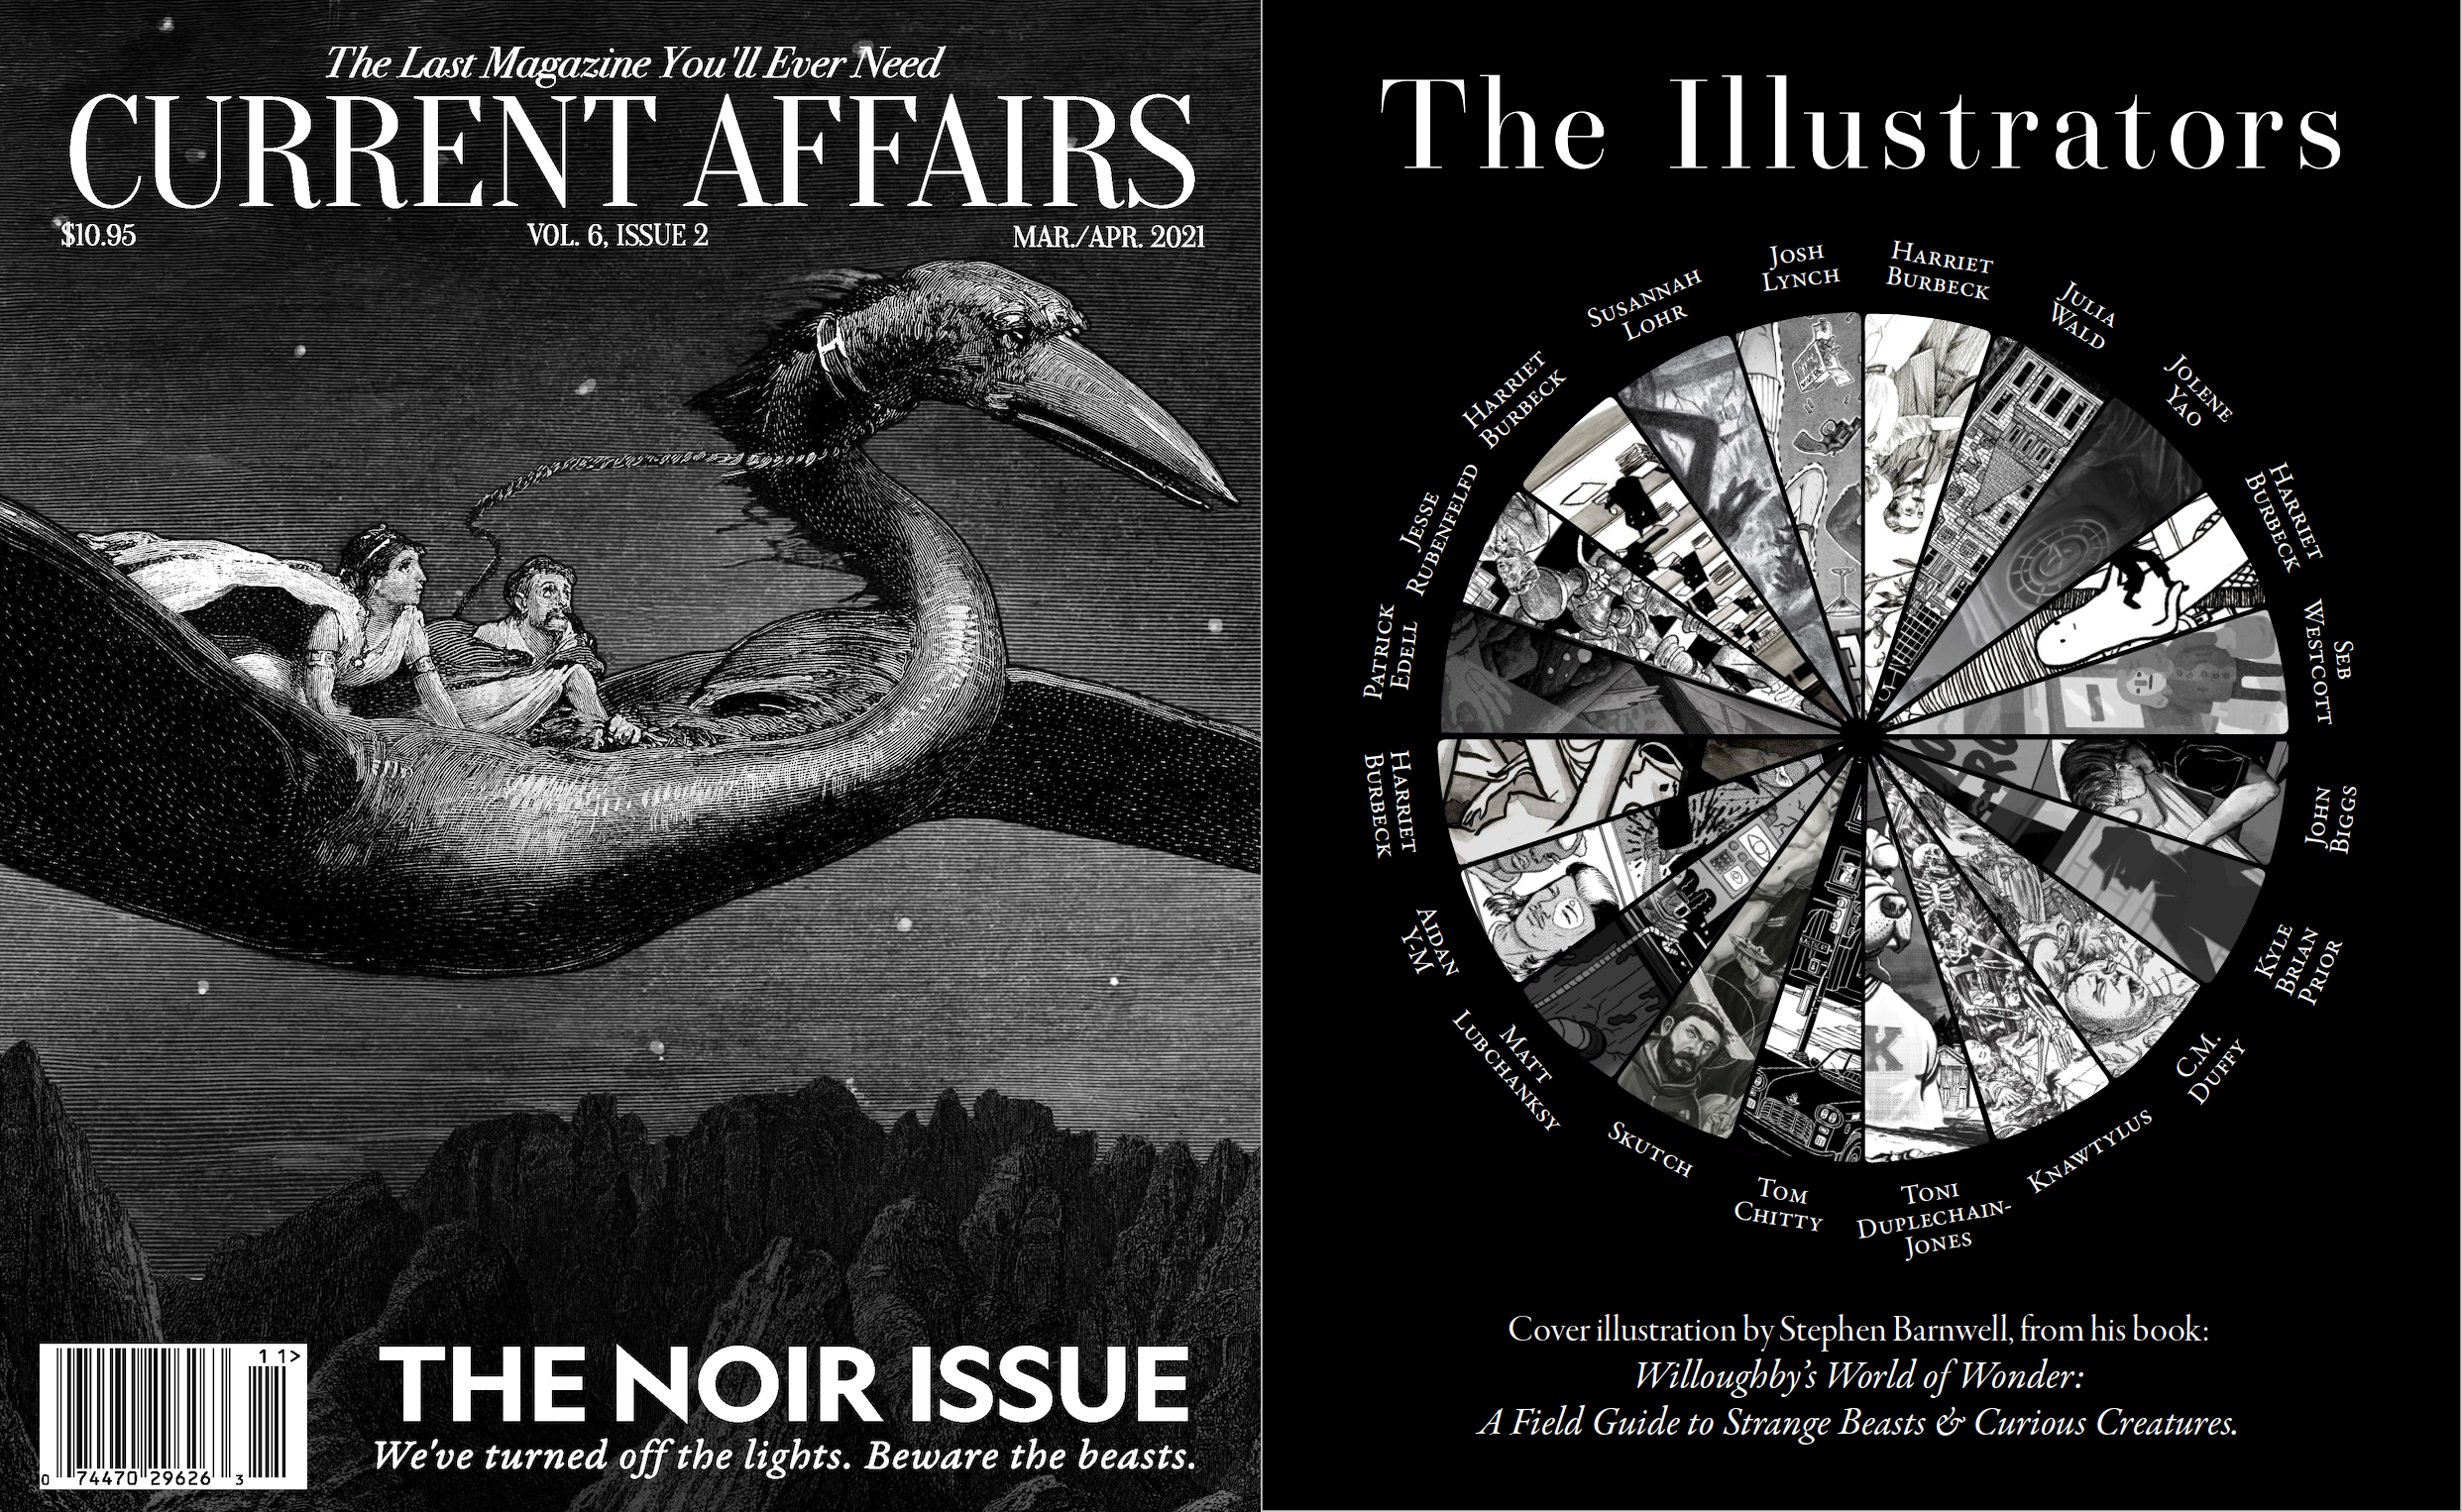 Single Order: Issue 30 (March-April 2021, Vol. 6, No. 2)